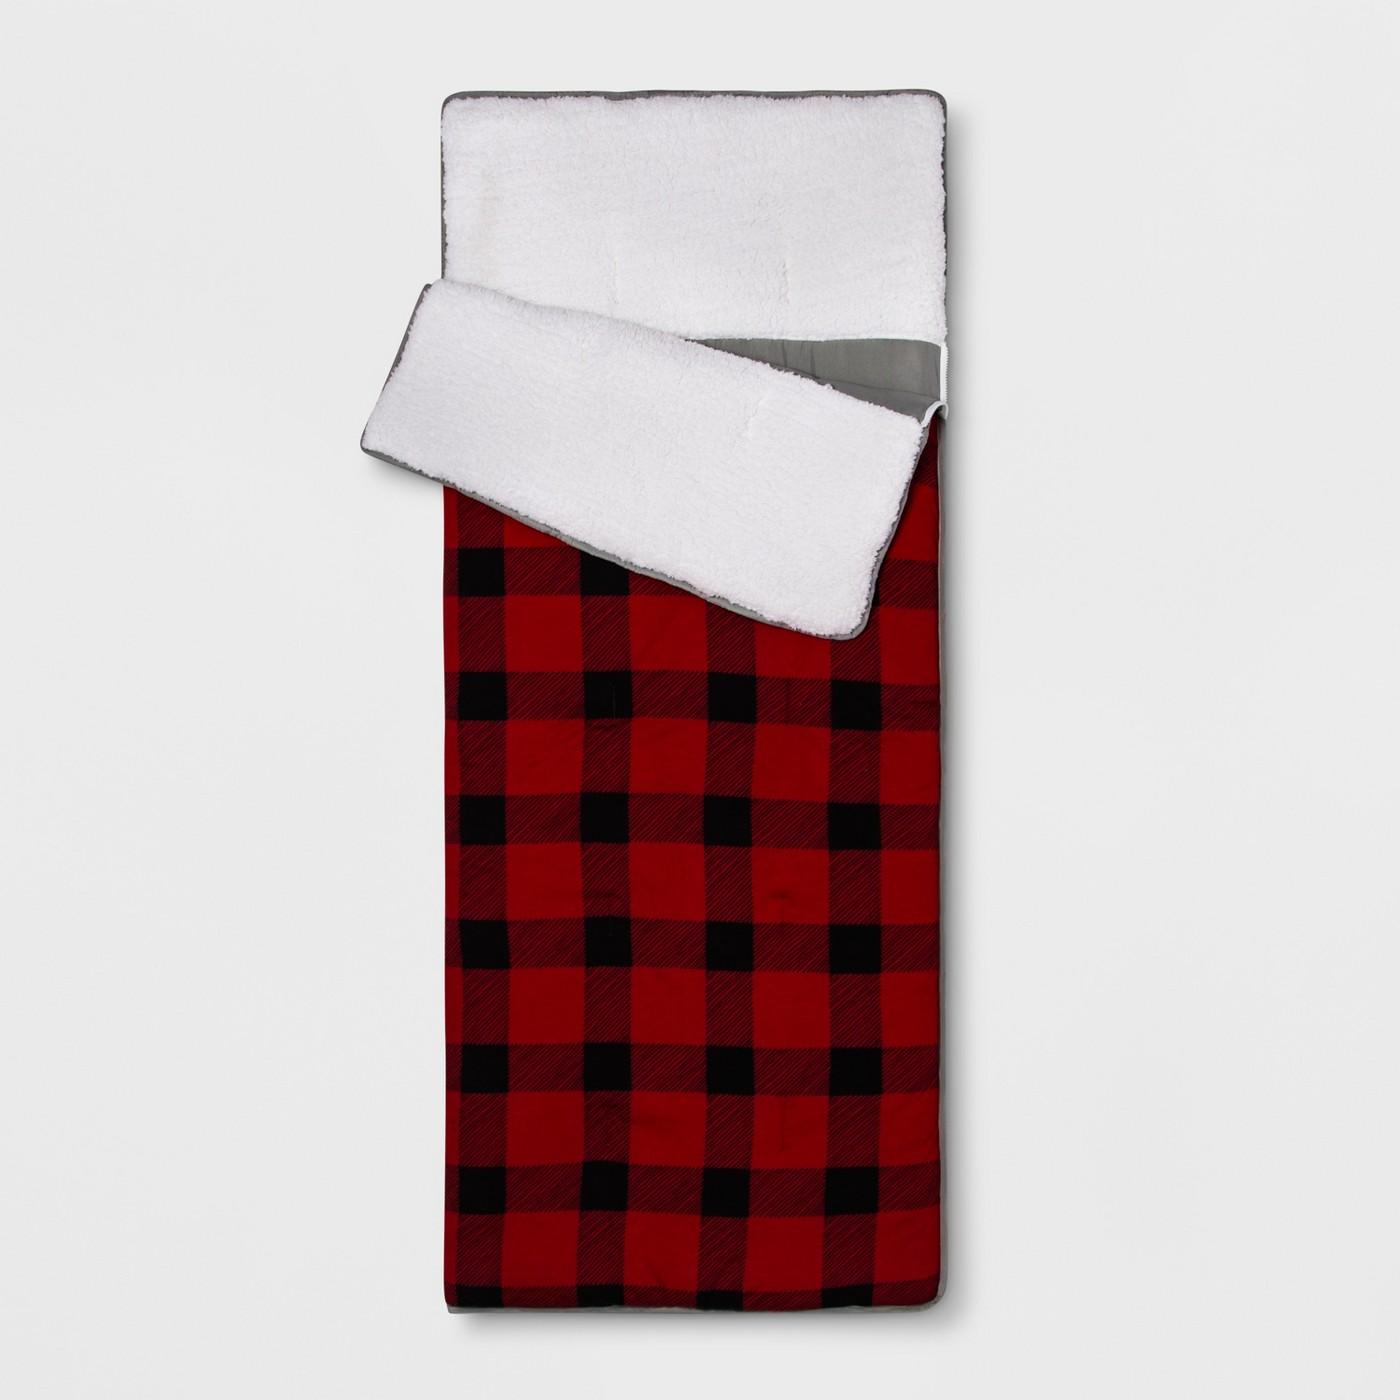 "Plaid Sleeping Bag Red - Pillowfortâ""¢ - image 1 of 1"